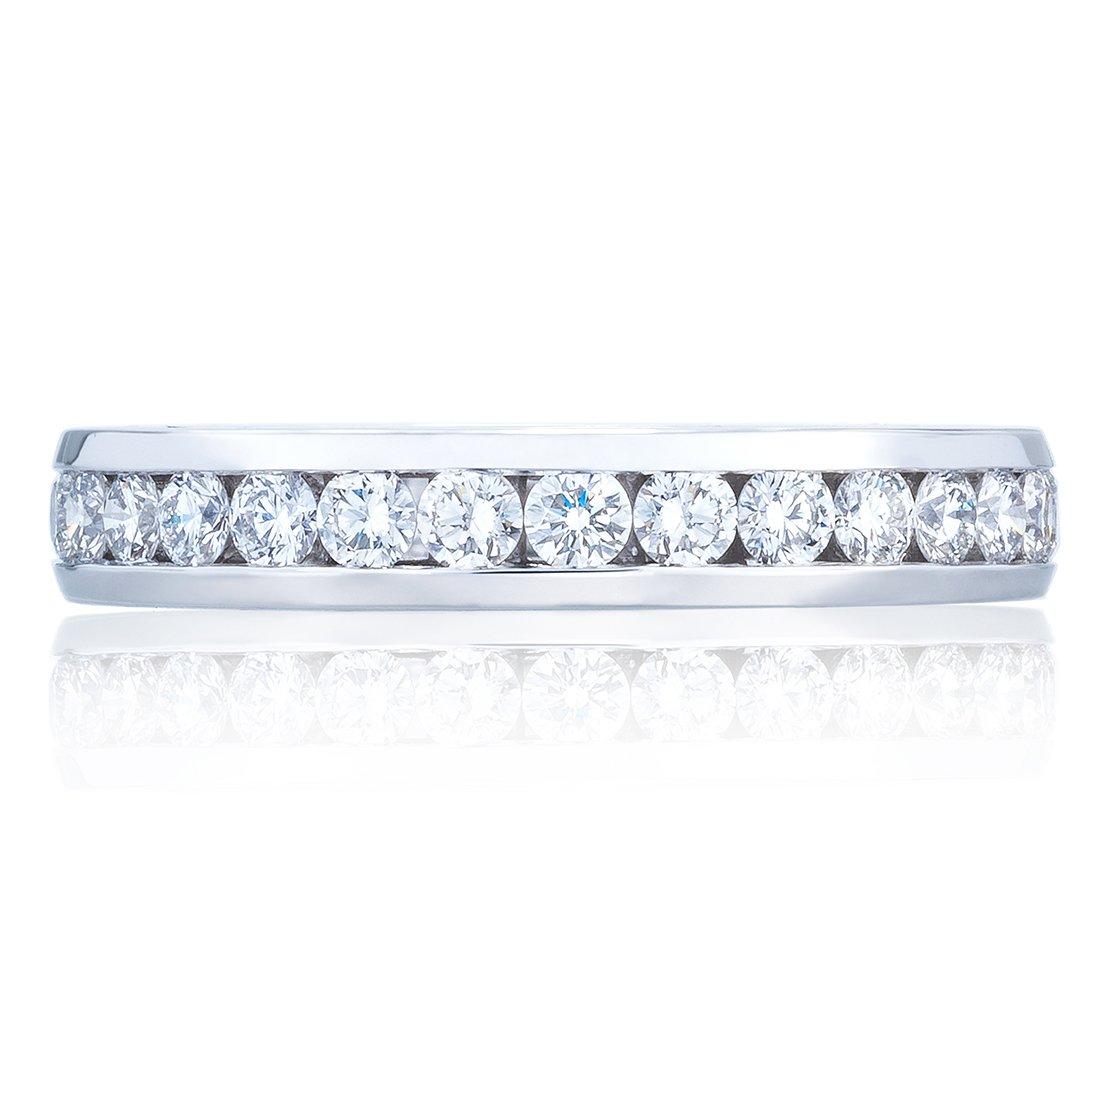 0c9bfabd1 Tacori Eternity 18K - White Gold Womens Wedding bands. Designer ...